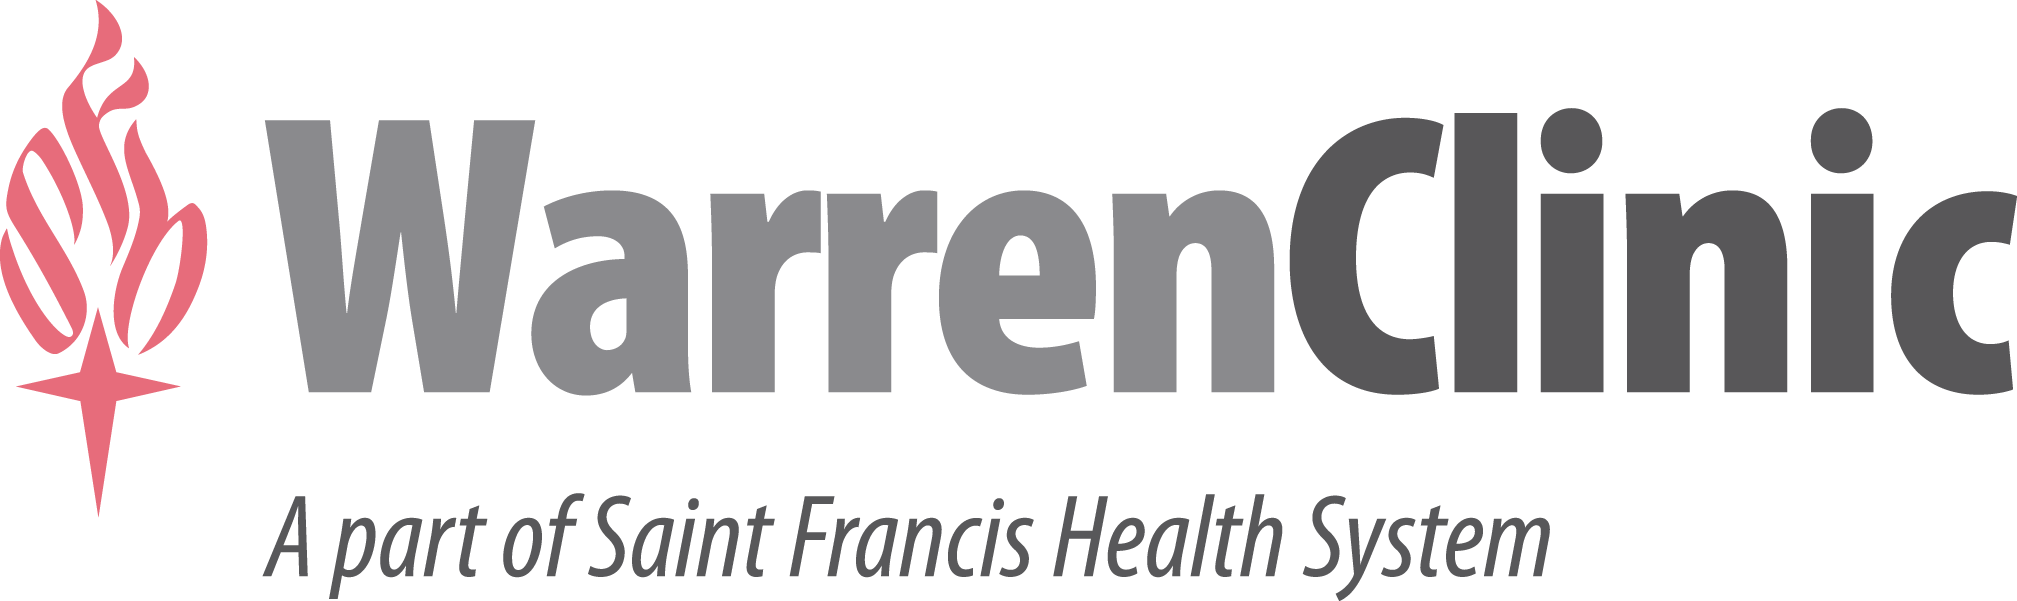 Pediatric Neurologist in Tulsa, Oklahoma - Warren Clinic